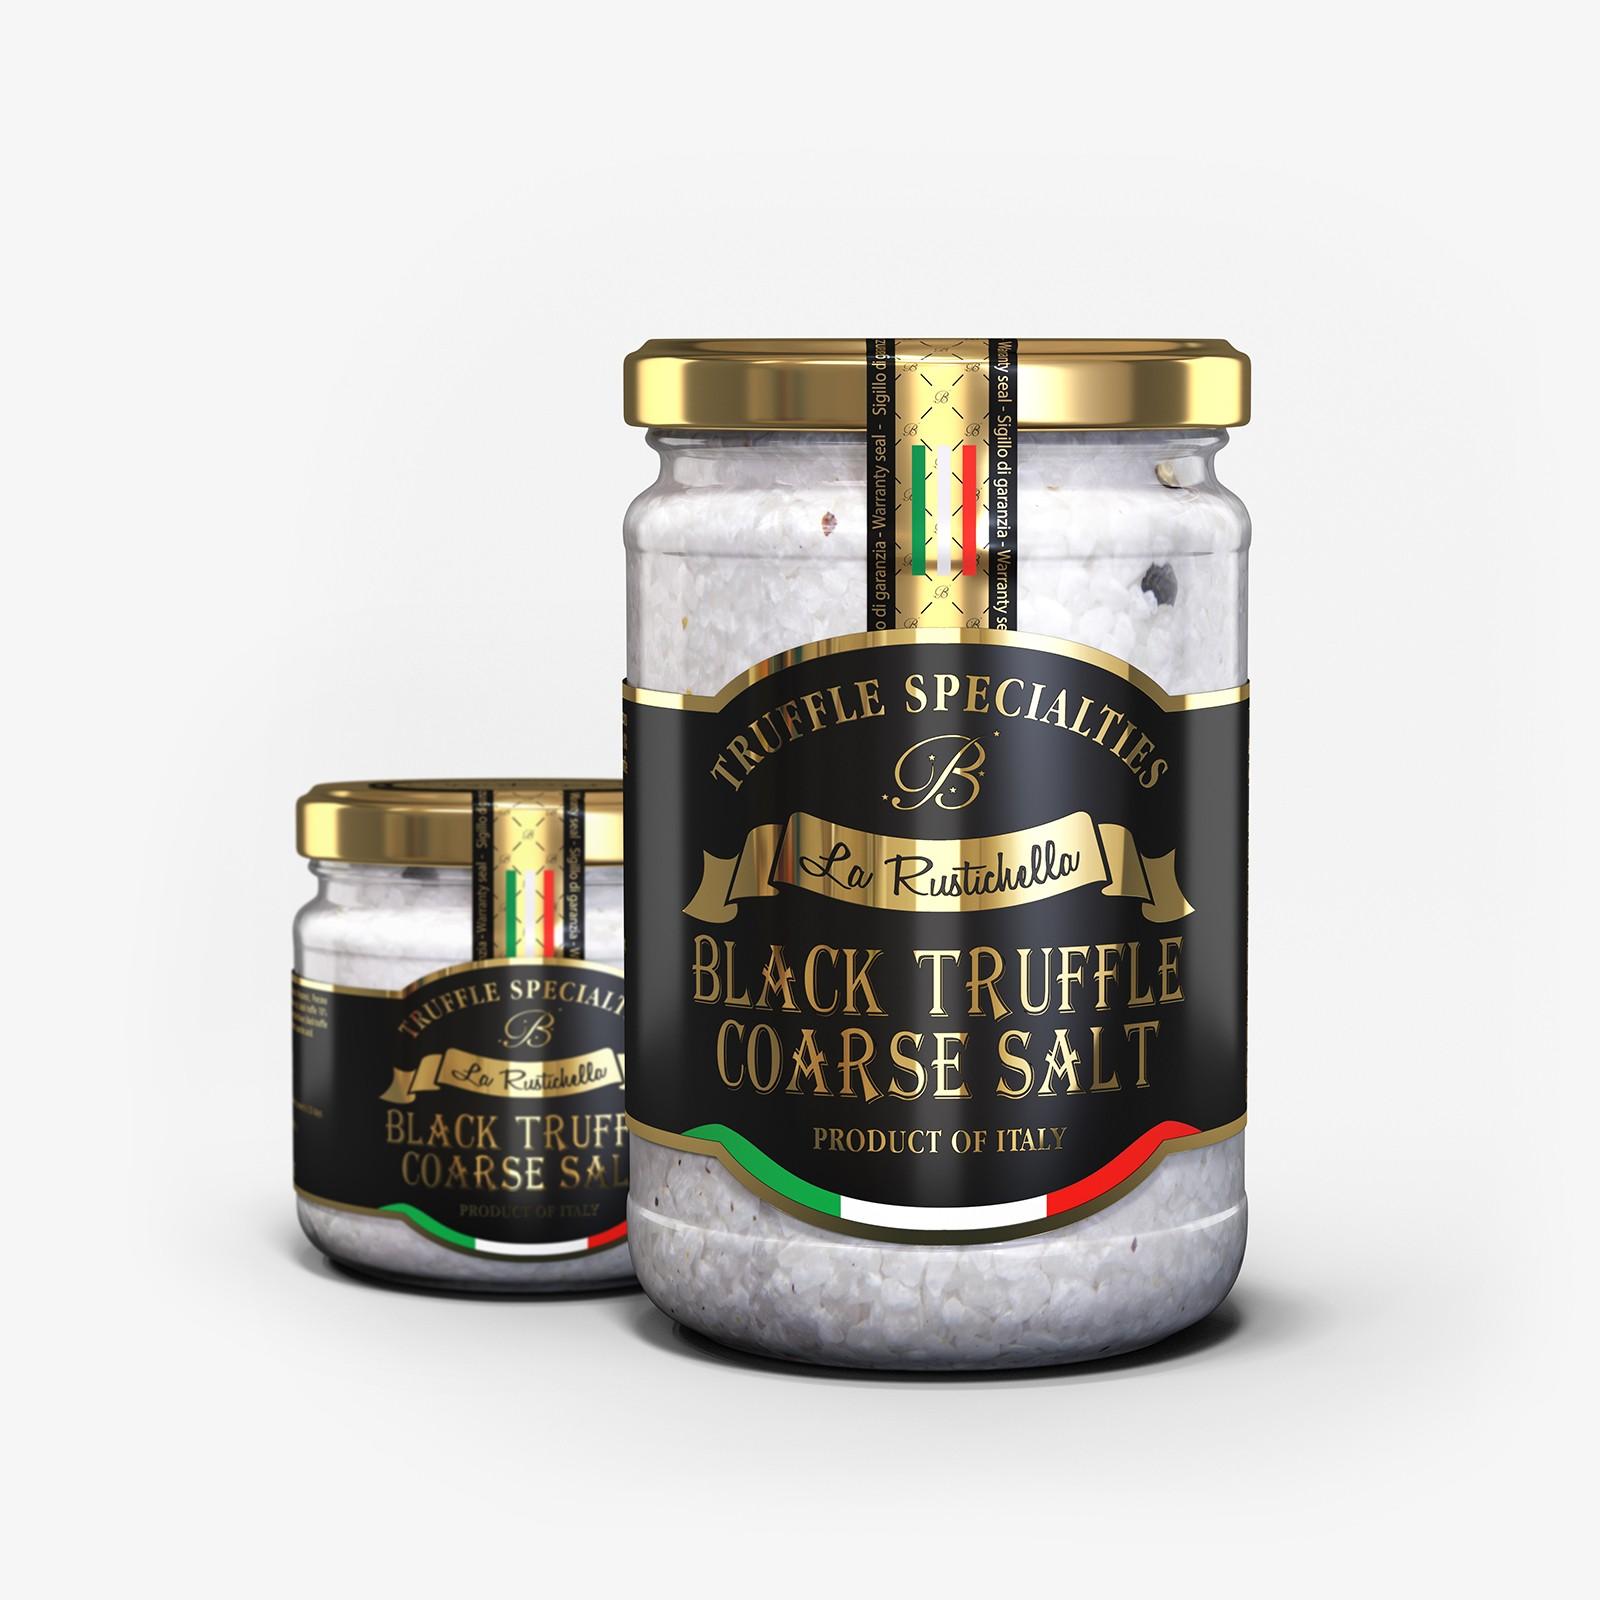 Sale Grosso al tartufo nero